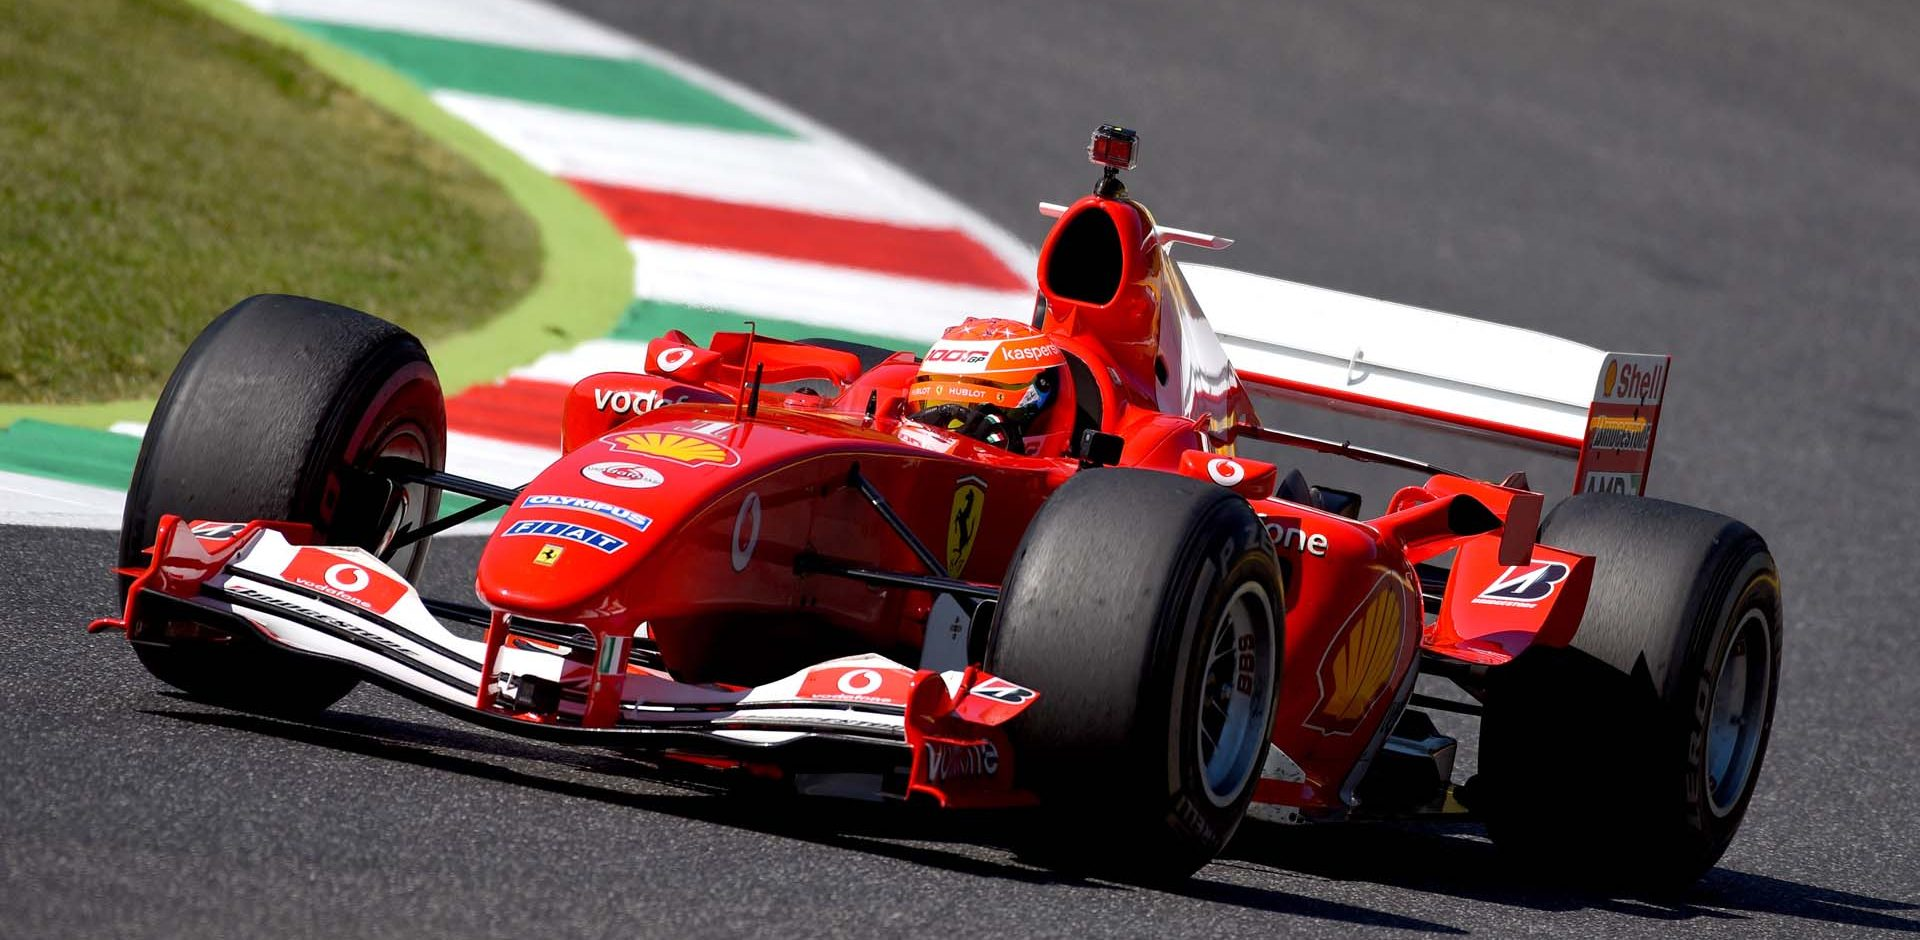 Mick Schumacher, Ferrar F2004, Tuscan Grand Prix 2020, Mugello